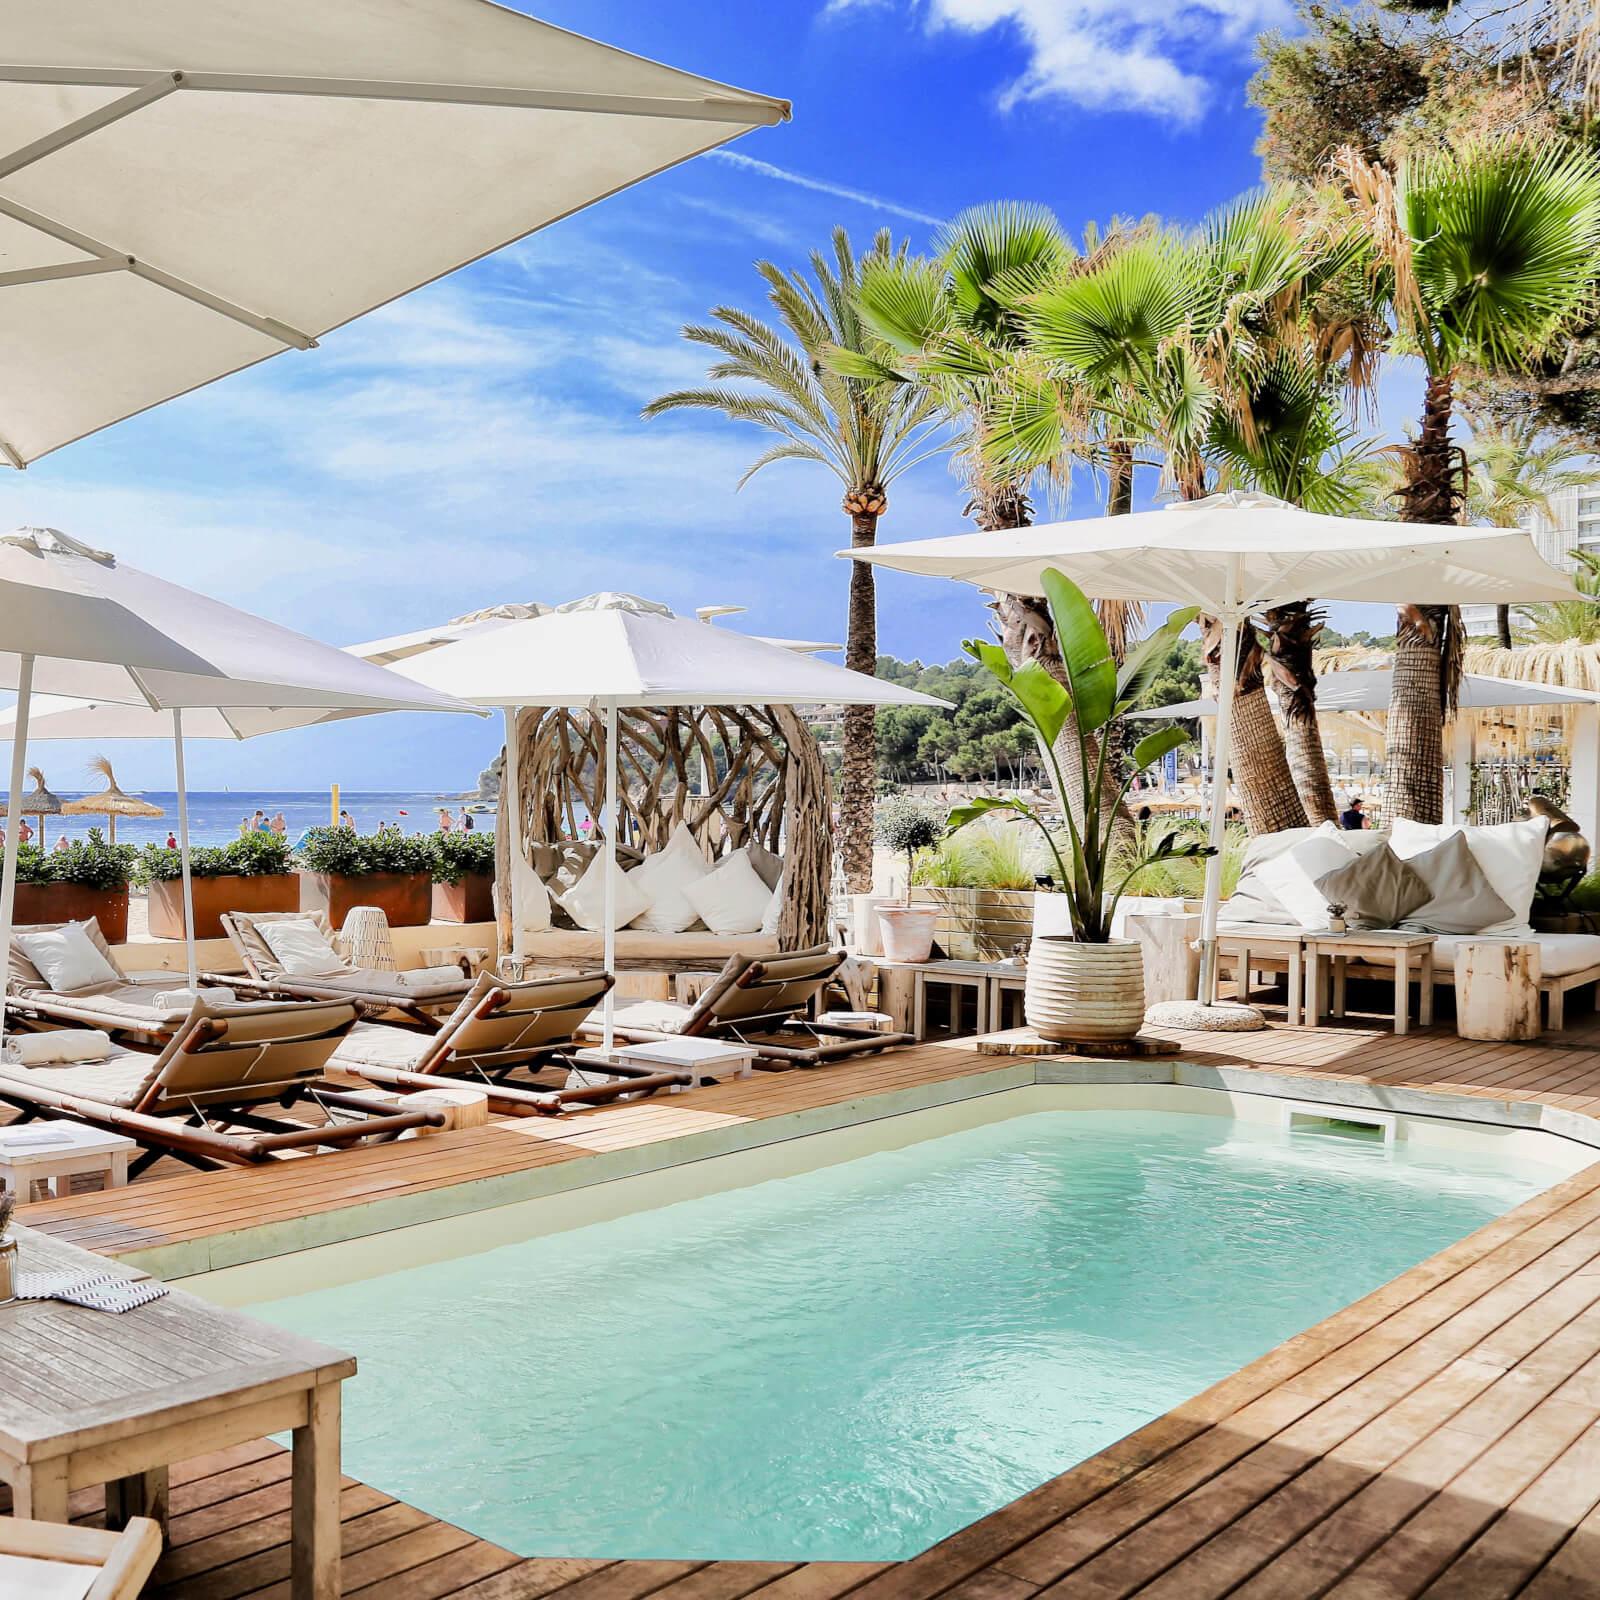 Zhero Boathouse Magaluf Mallorca Chillout-Restaurant Beachclub